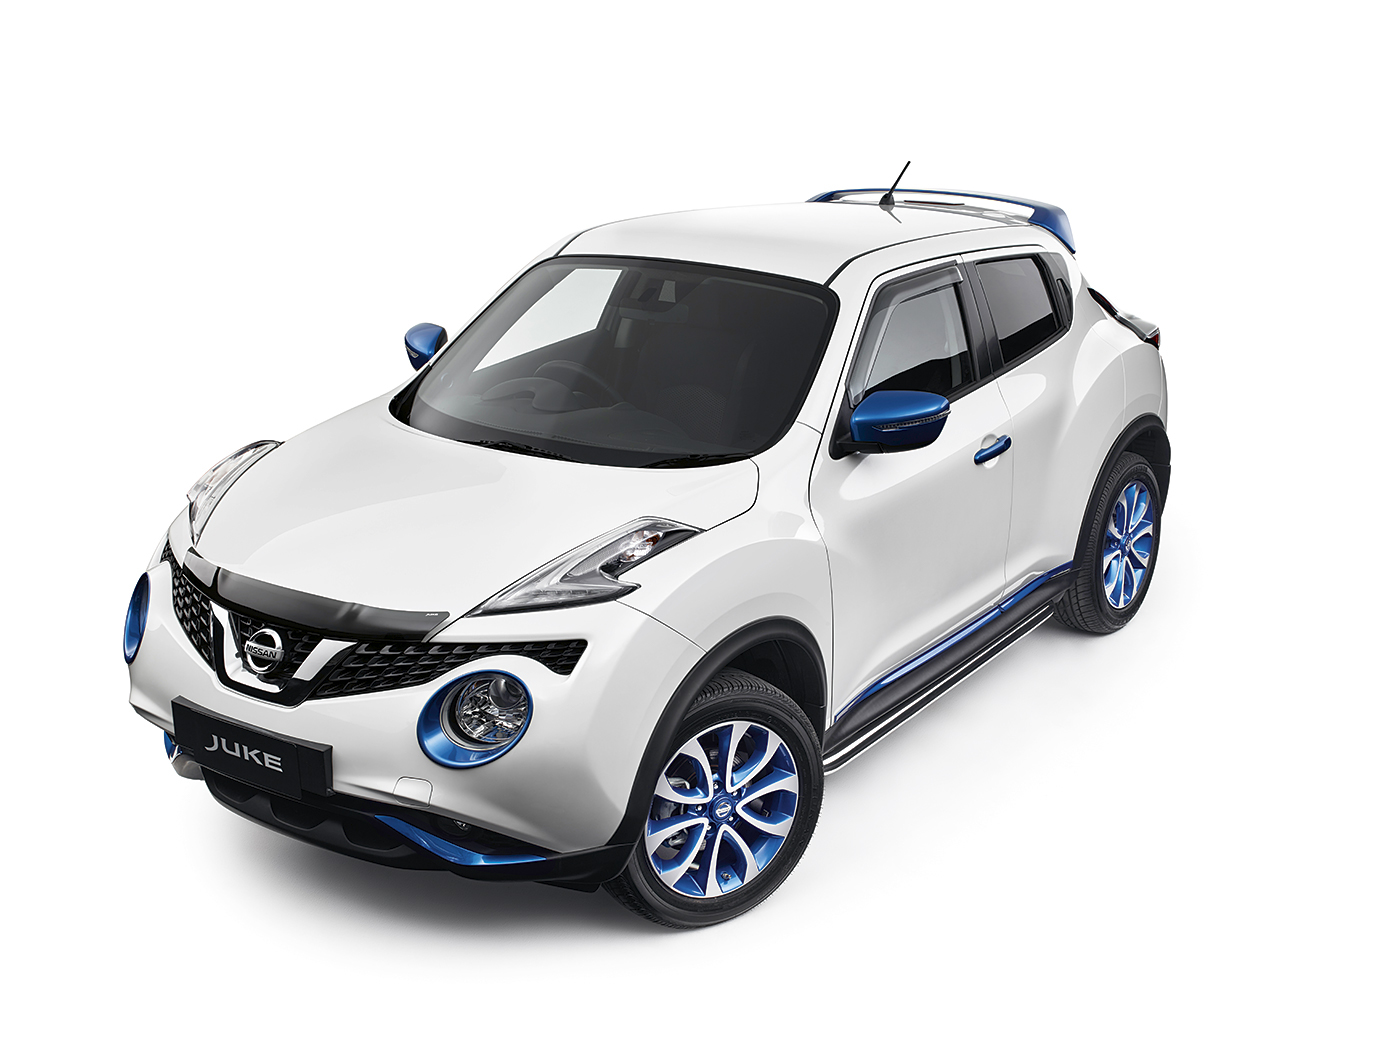 Nissan Juke Fuel Filter Location Wiring Diagram Titan Colour Change And Retouching On Behance Toyota Matrix